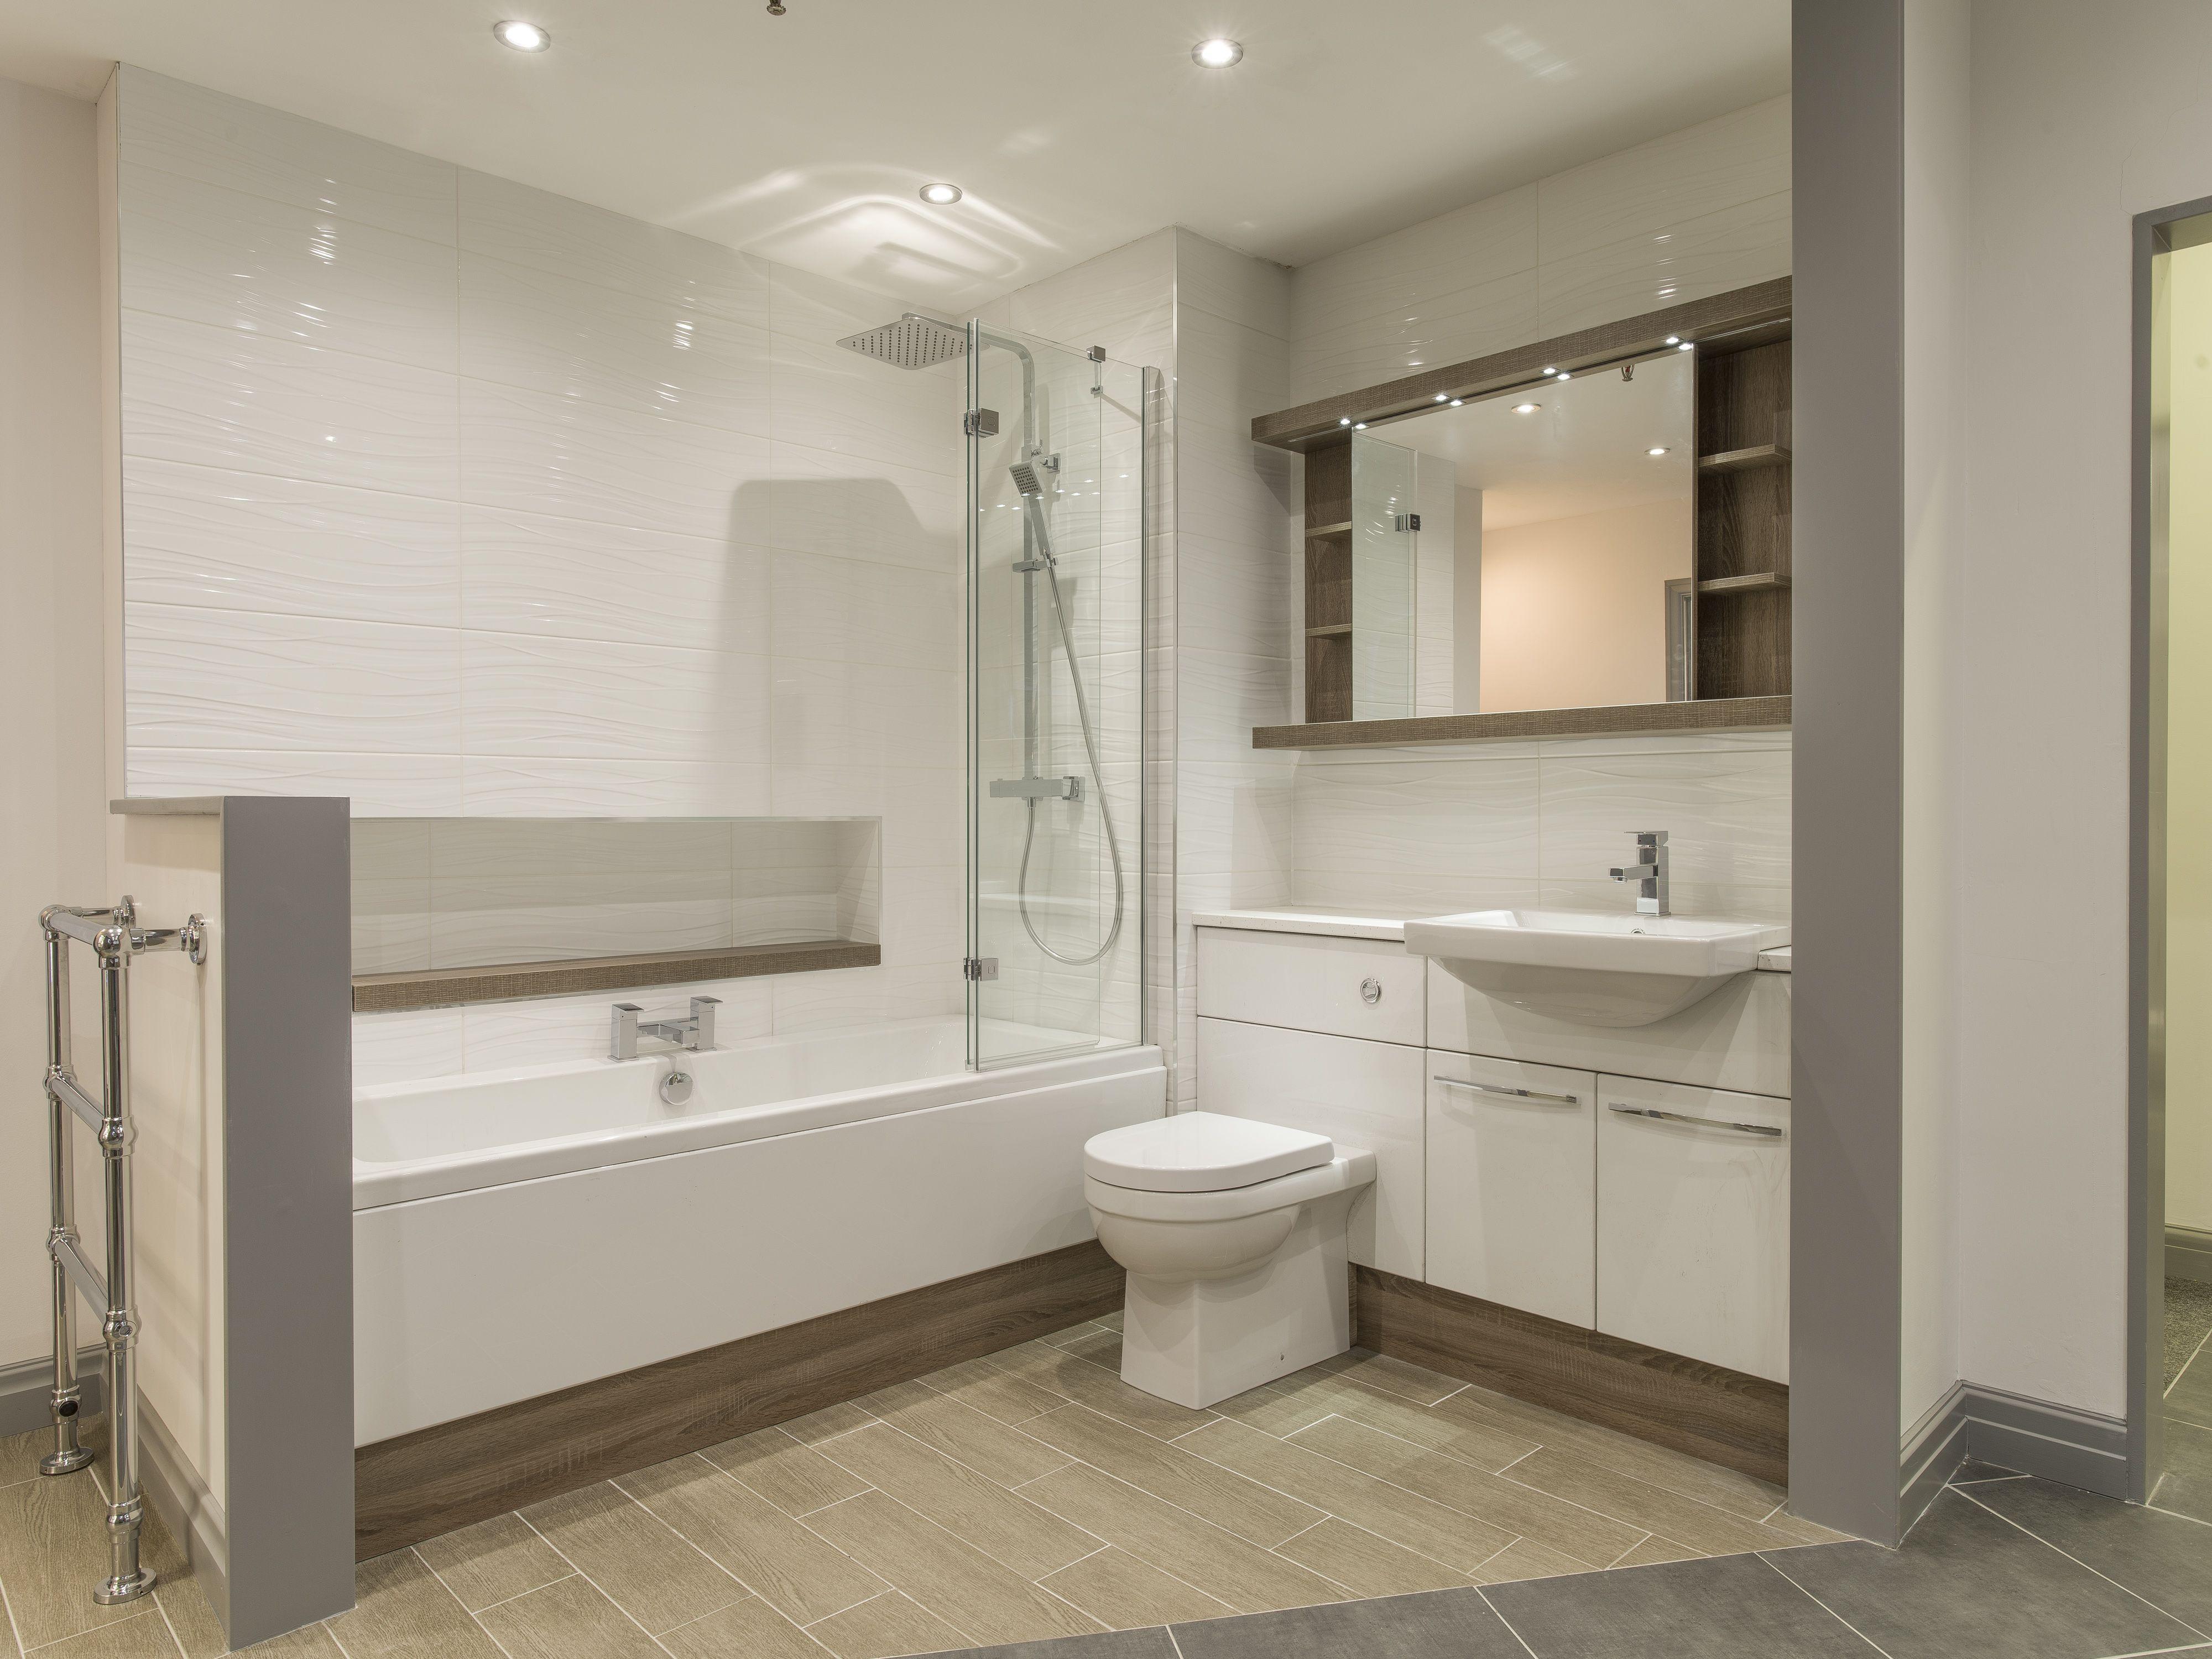 29+ Bathroom showrooms ideas in 2021